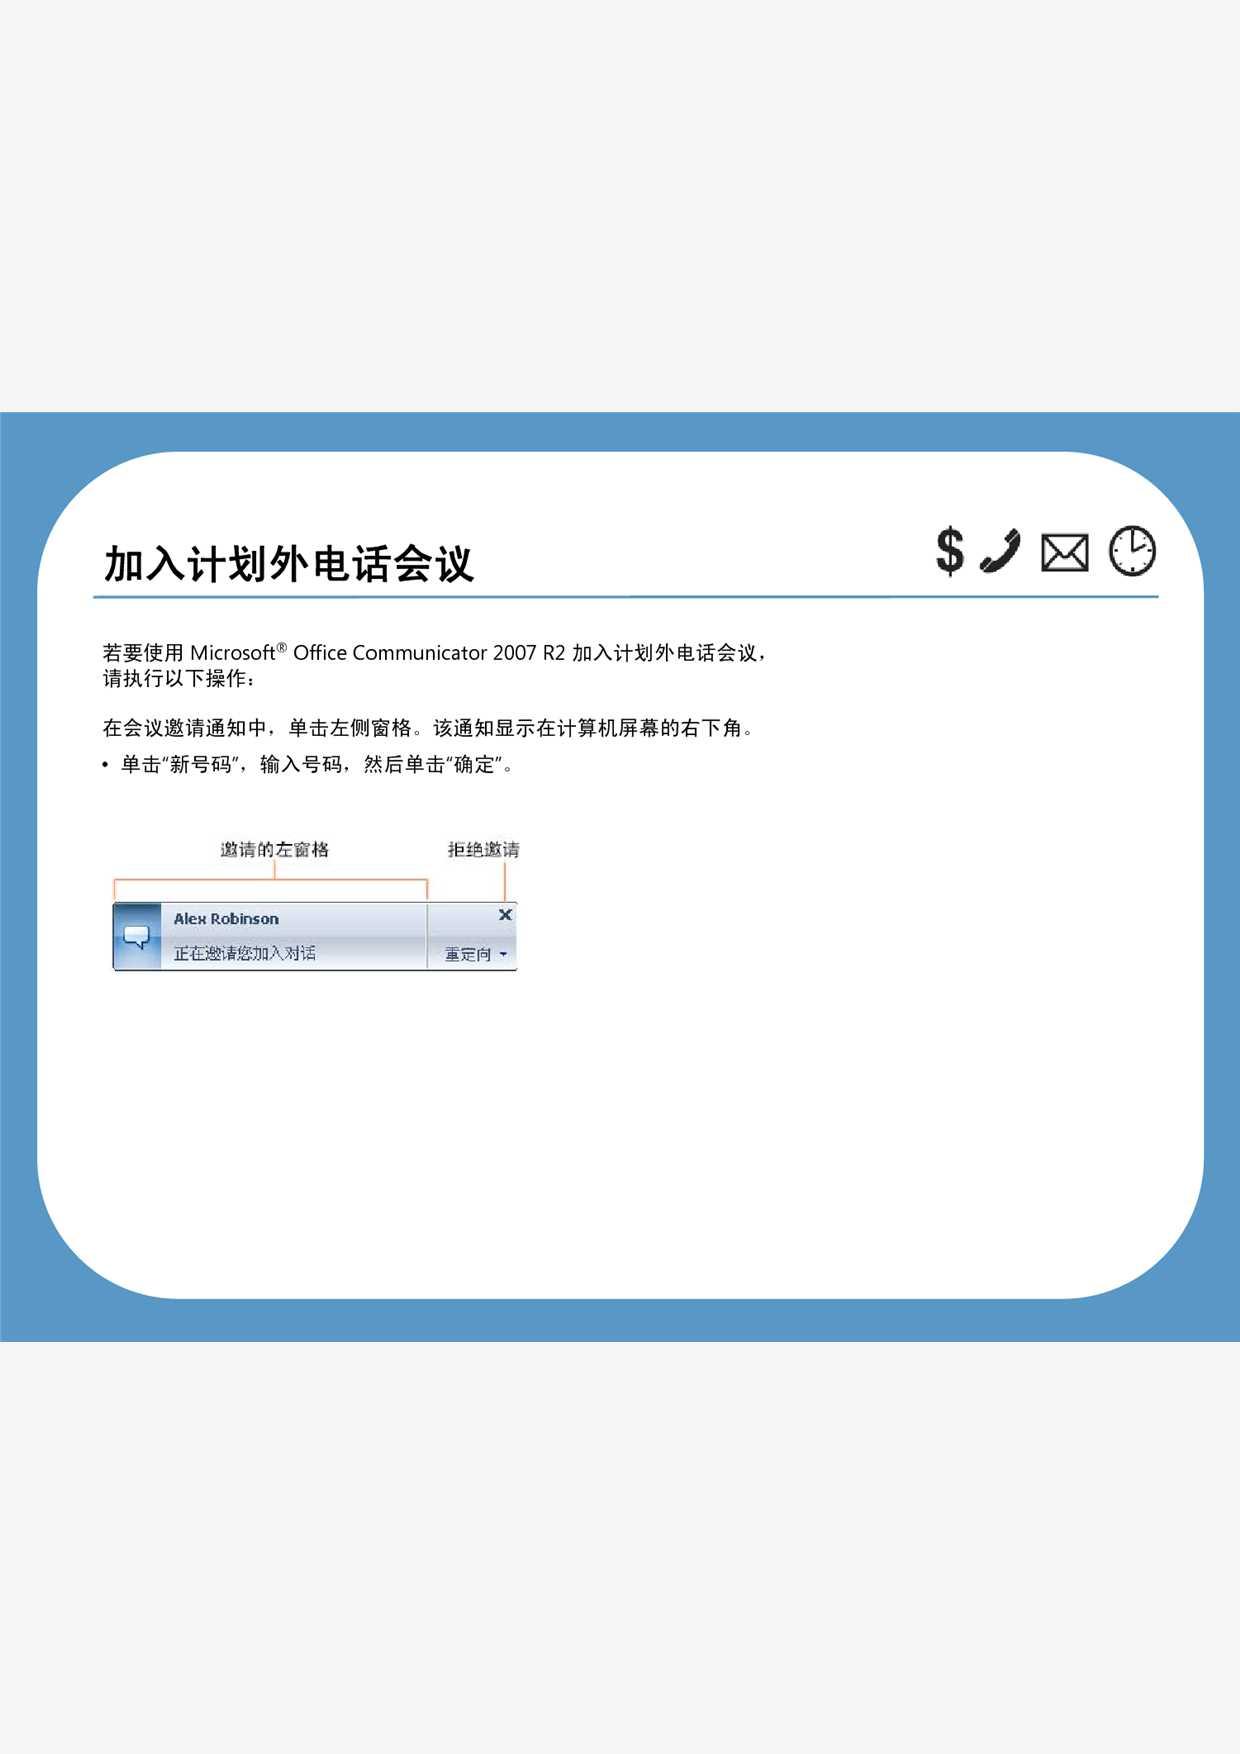 office电子书下载_microsoft office communicator 2007 r2 中的新增功能